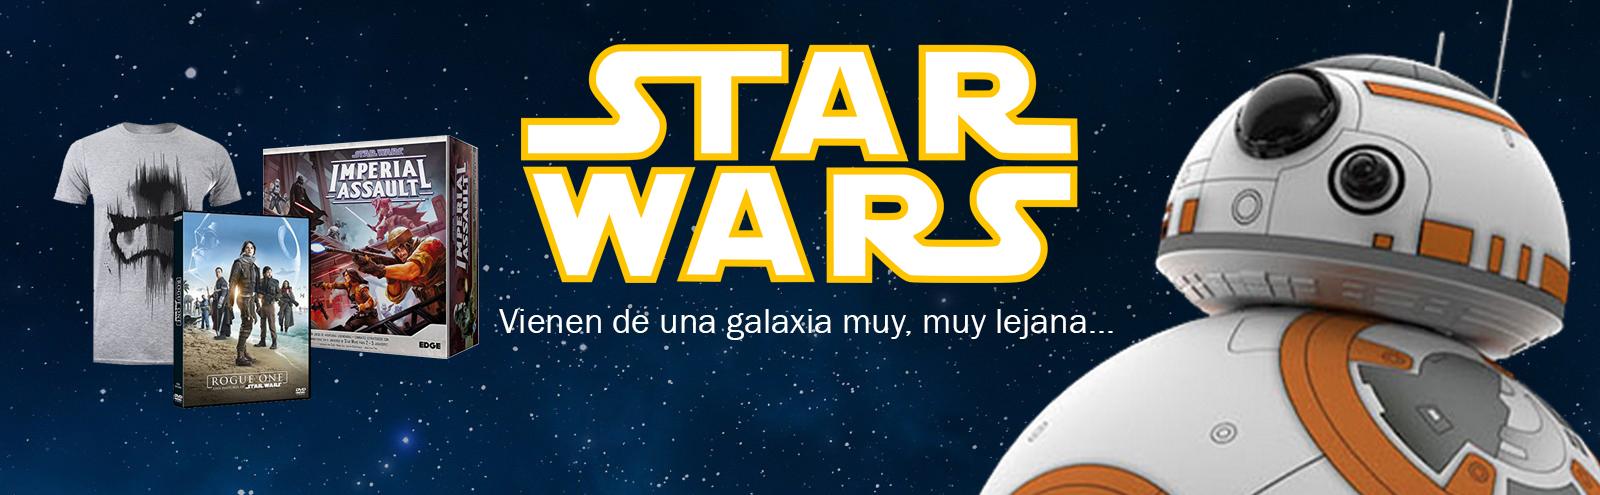 fondo-star-wars